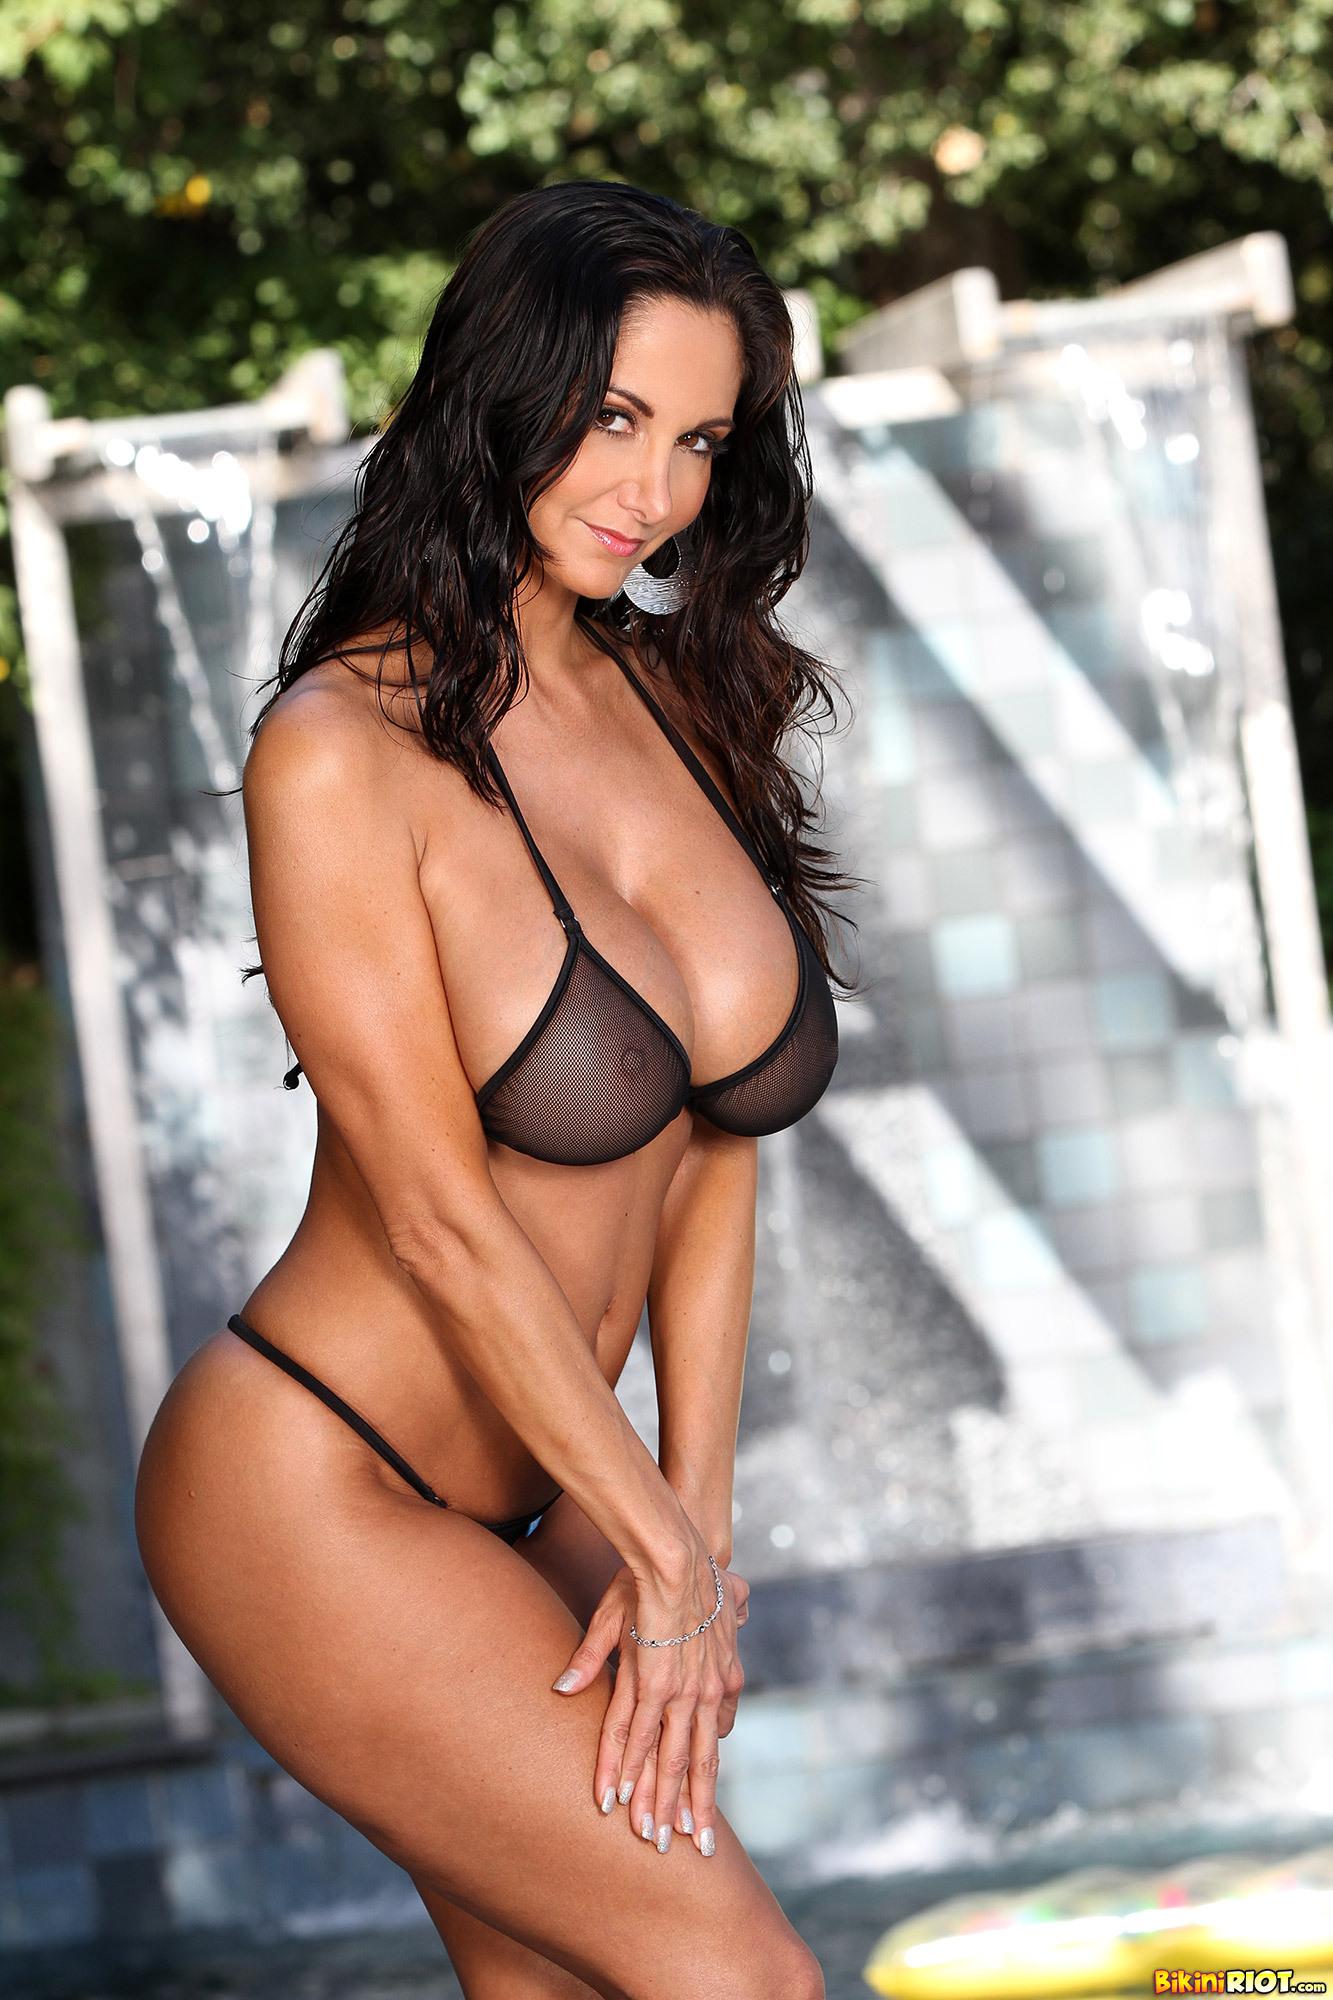 ava addams bikini riot